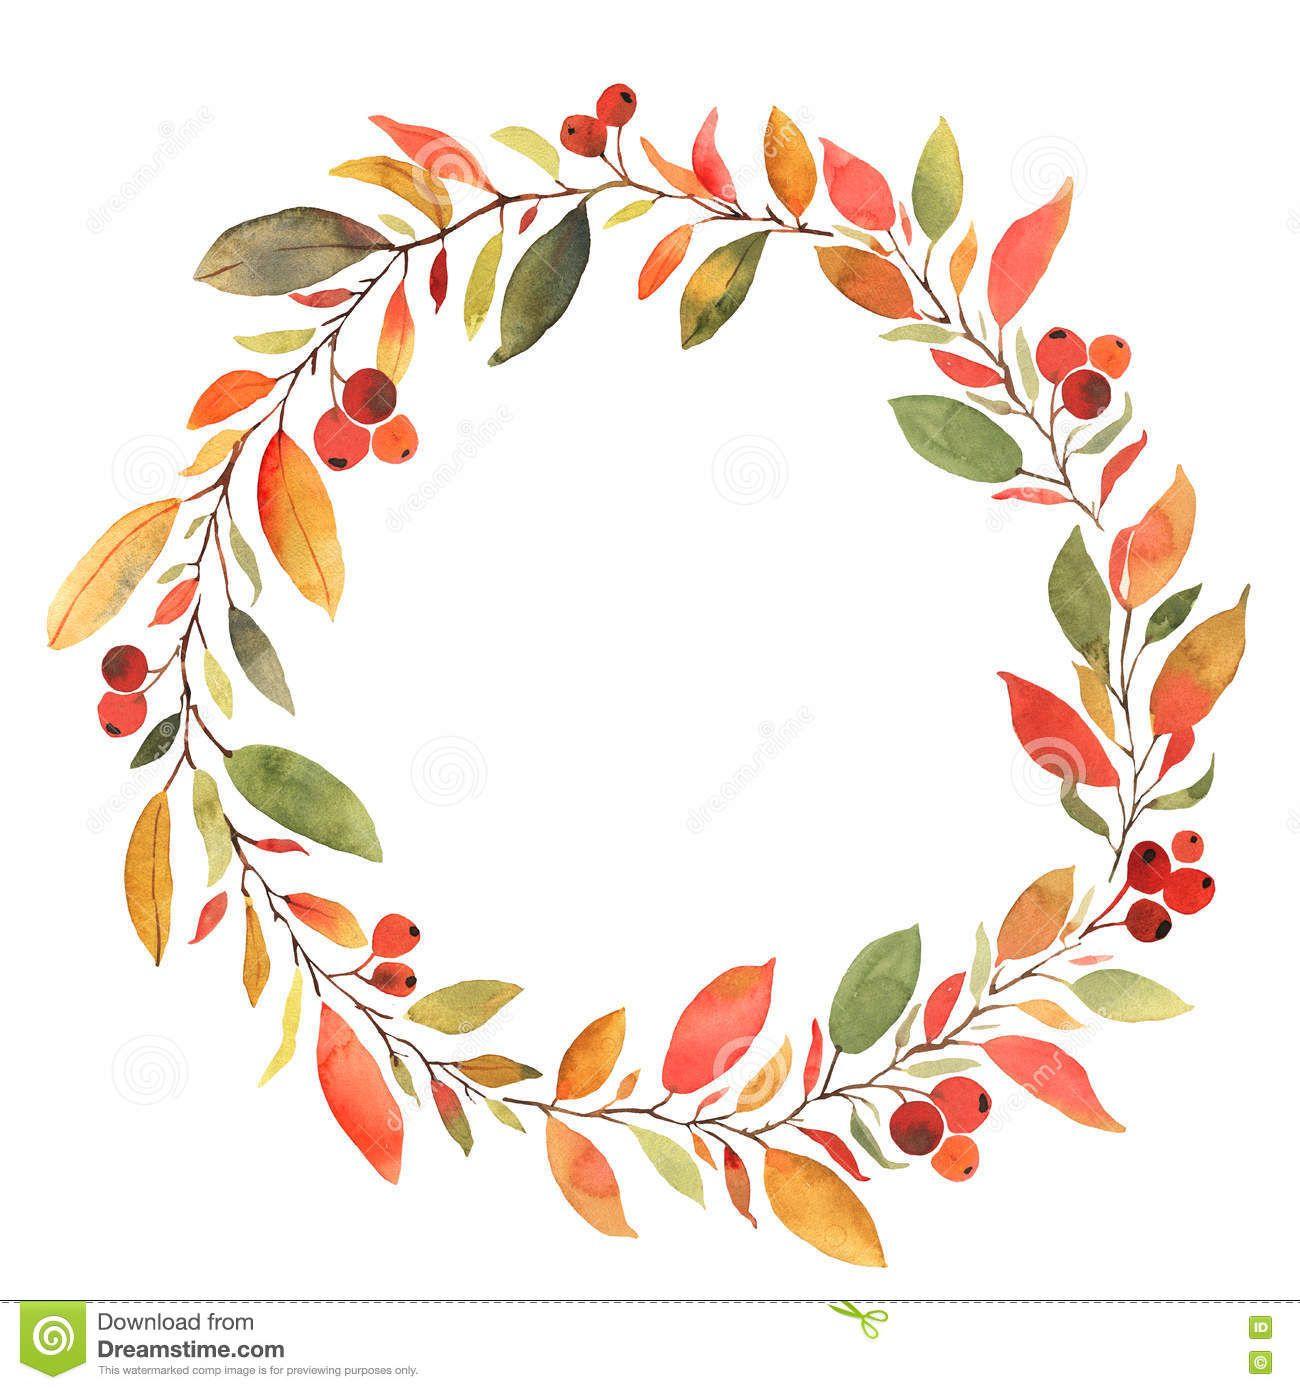 Free fall wreath clipart transparent download Fall Wreath Clipart Free | Tattoo ideas in 2019 | Wreath watercolor ... transparent download